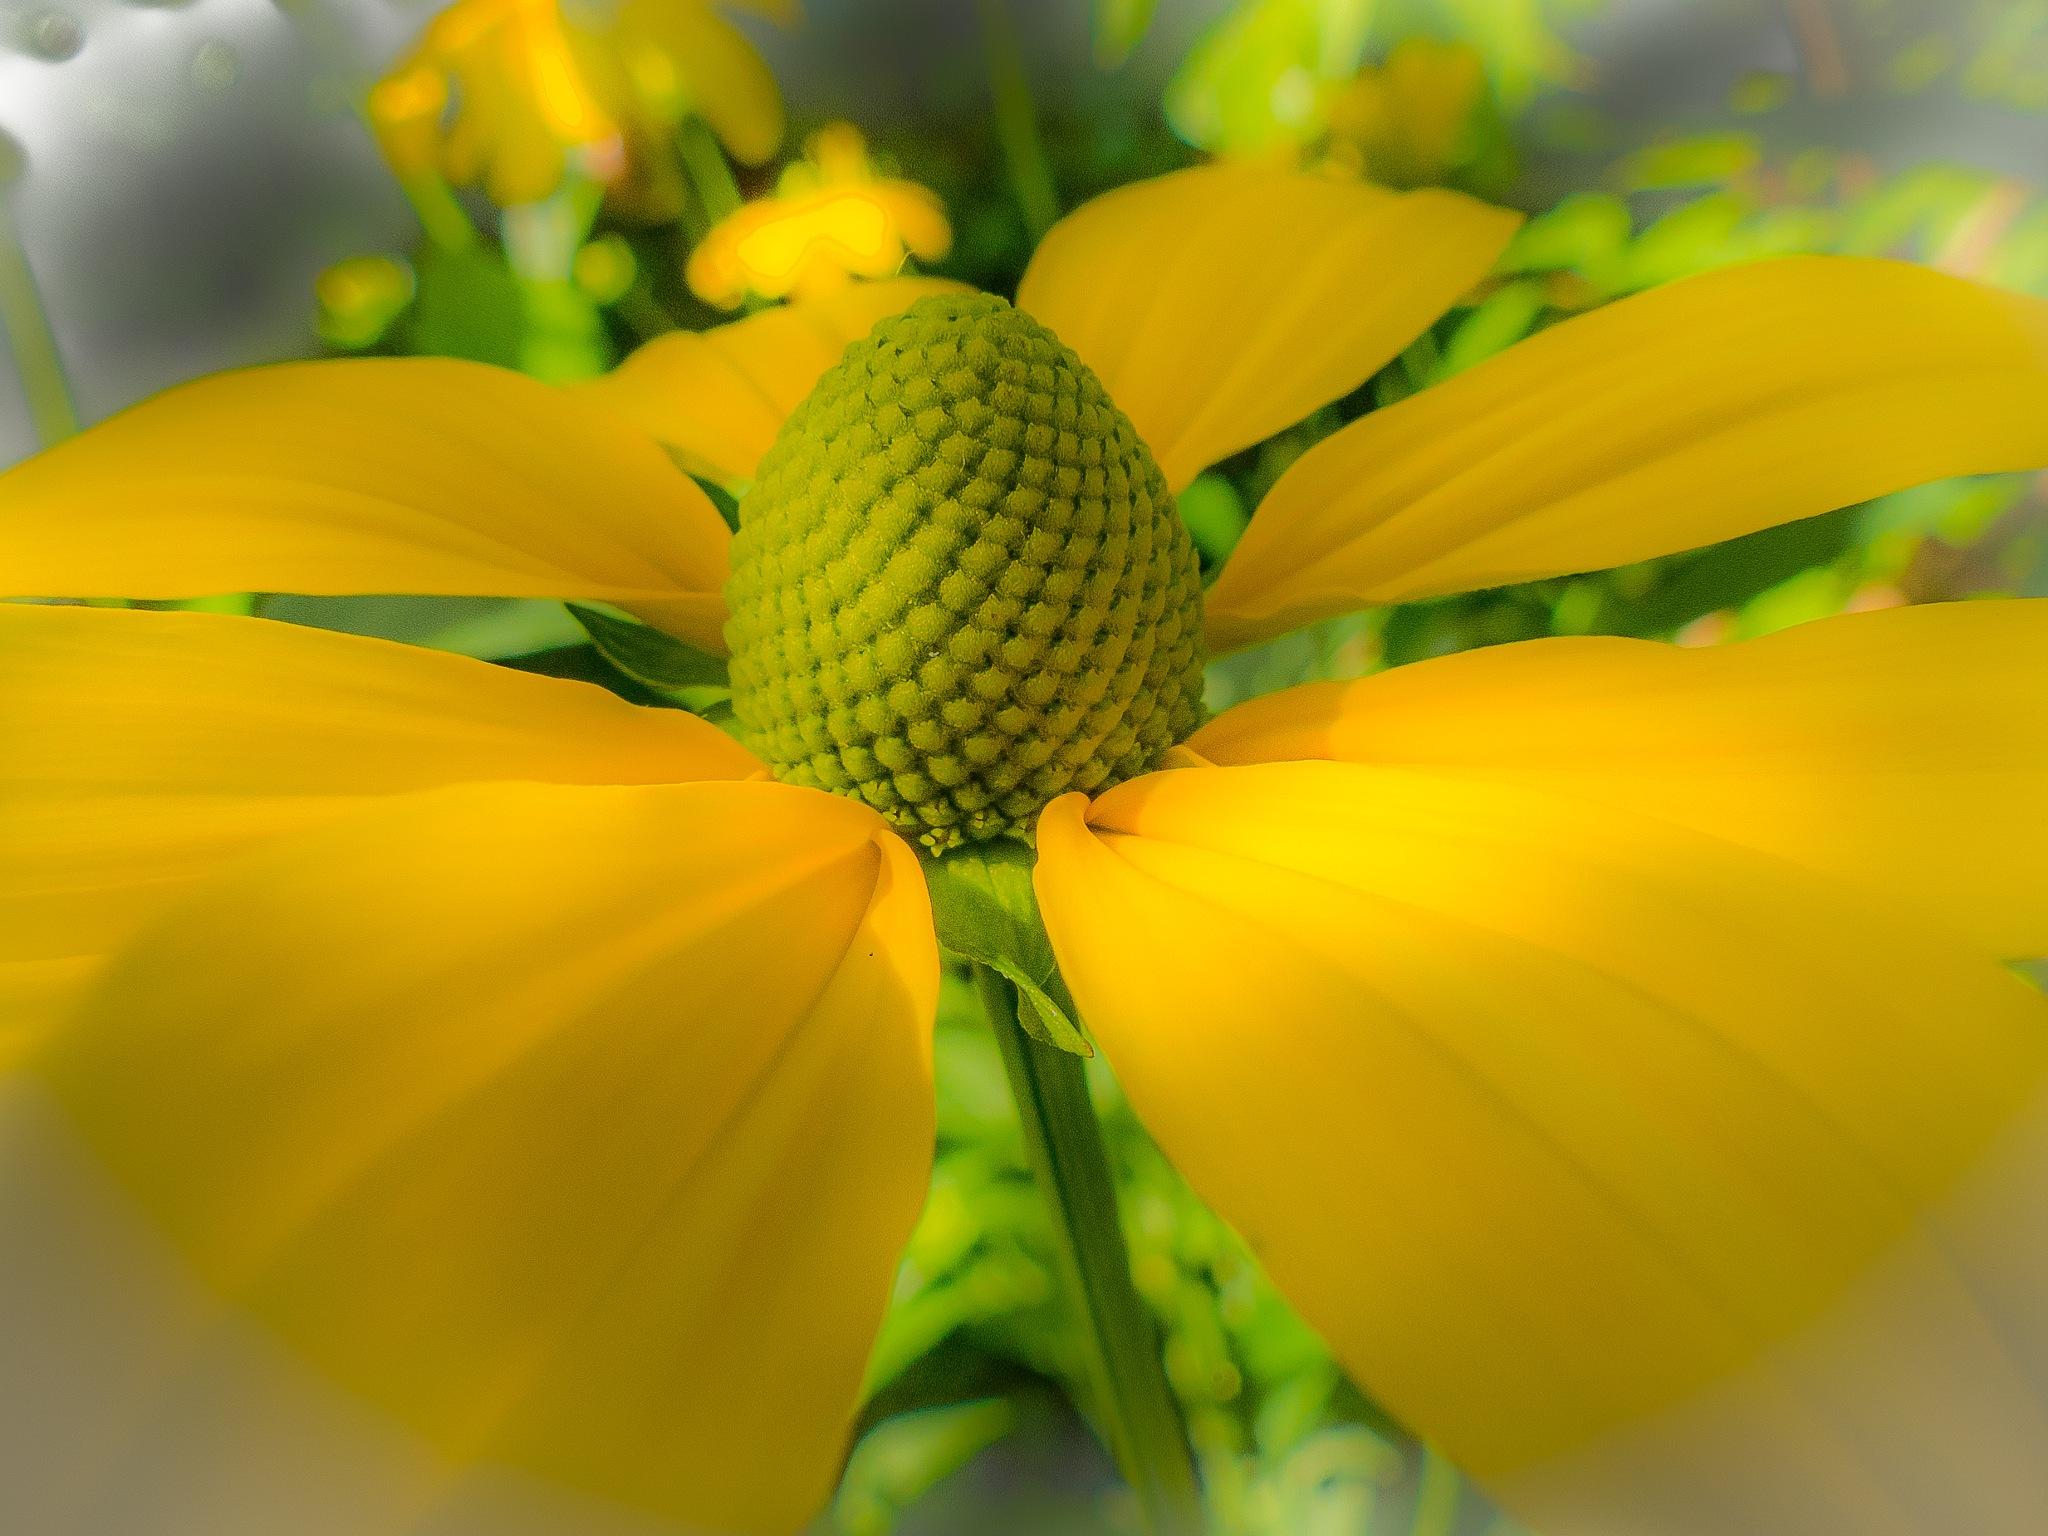 flower by Paul Geutjes